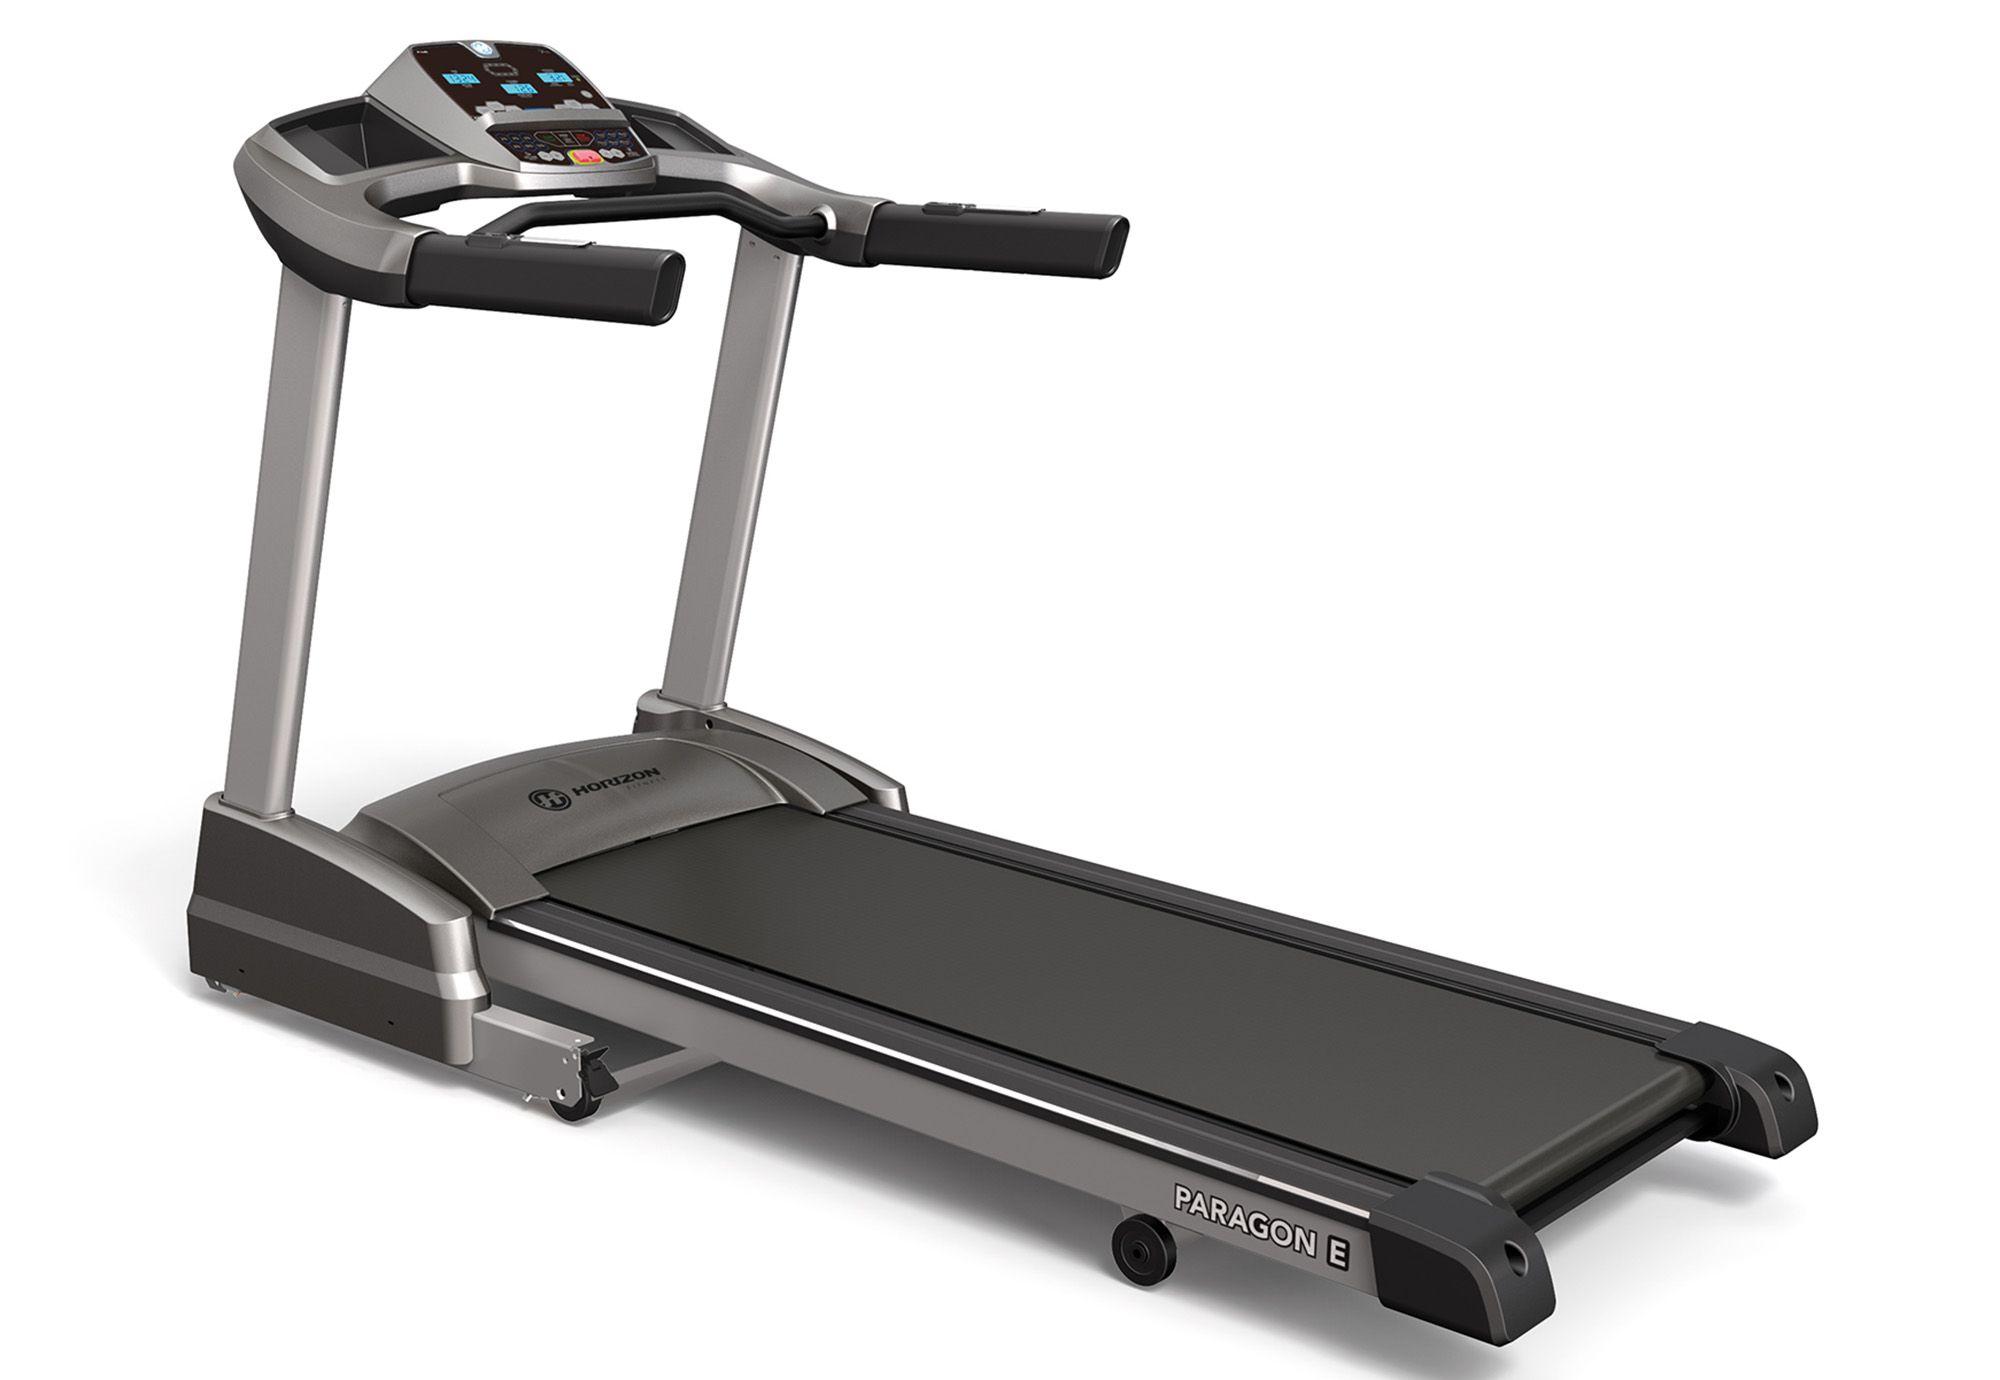 HORIZON FITNESS Laufband, »Paragon 7E«, Horizon Fitness